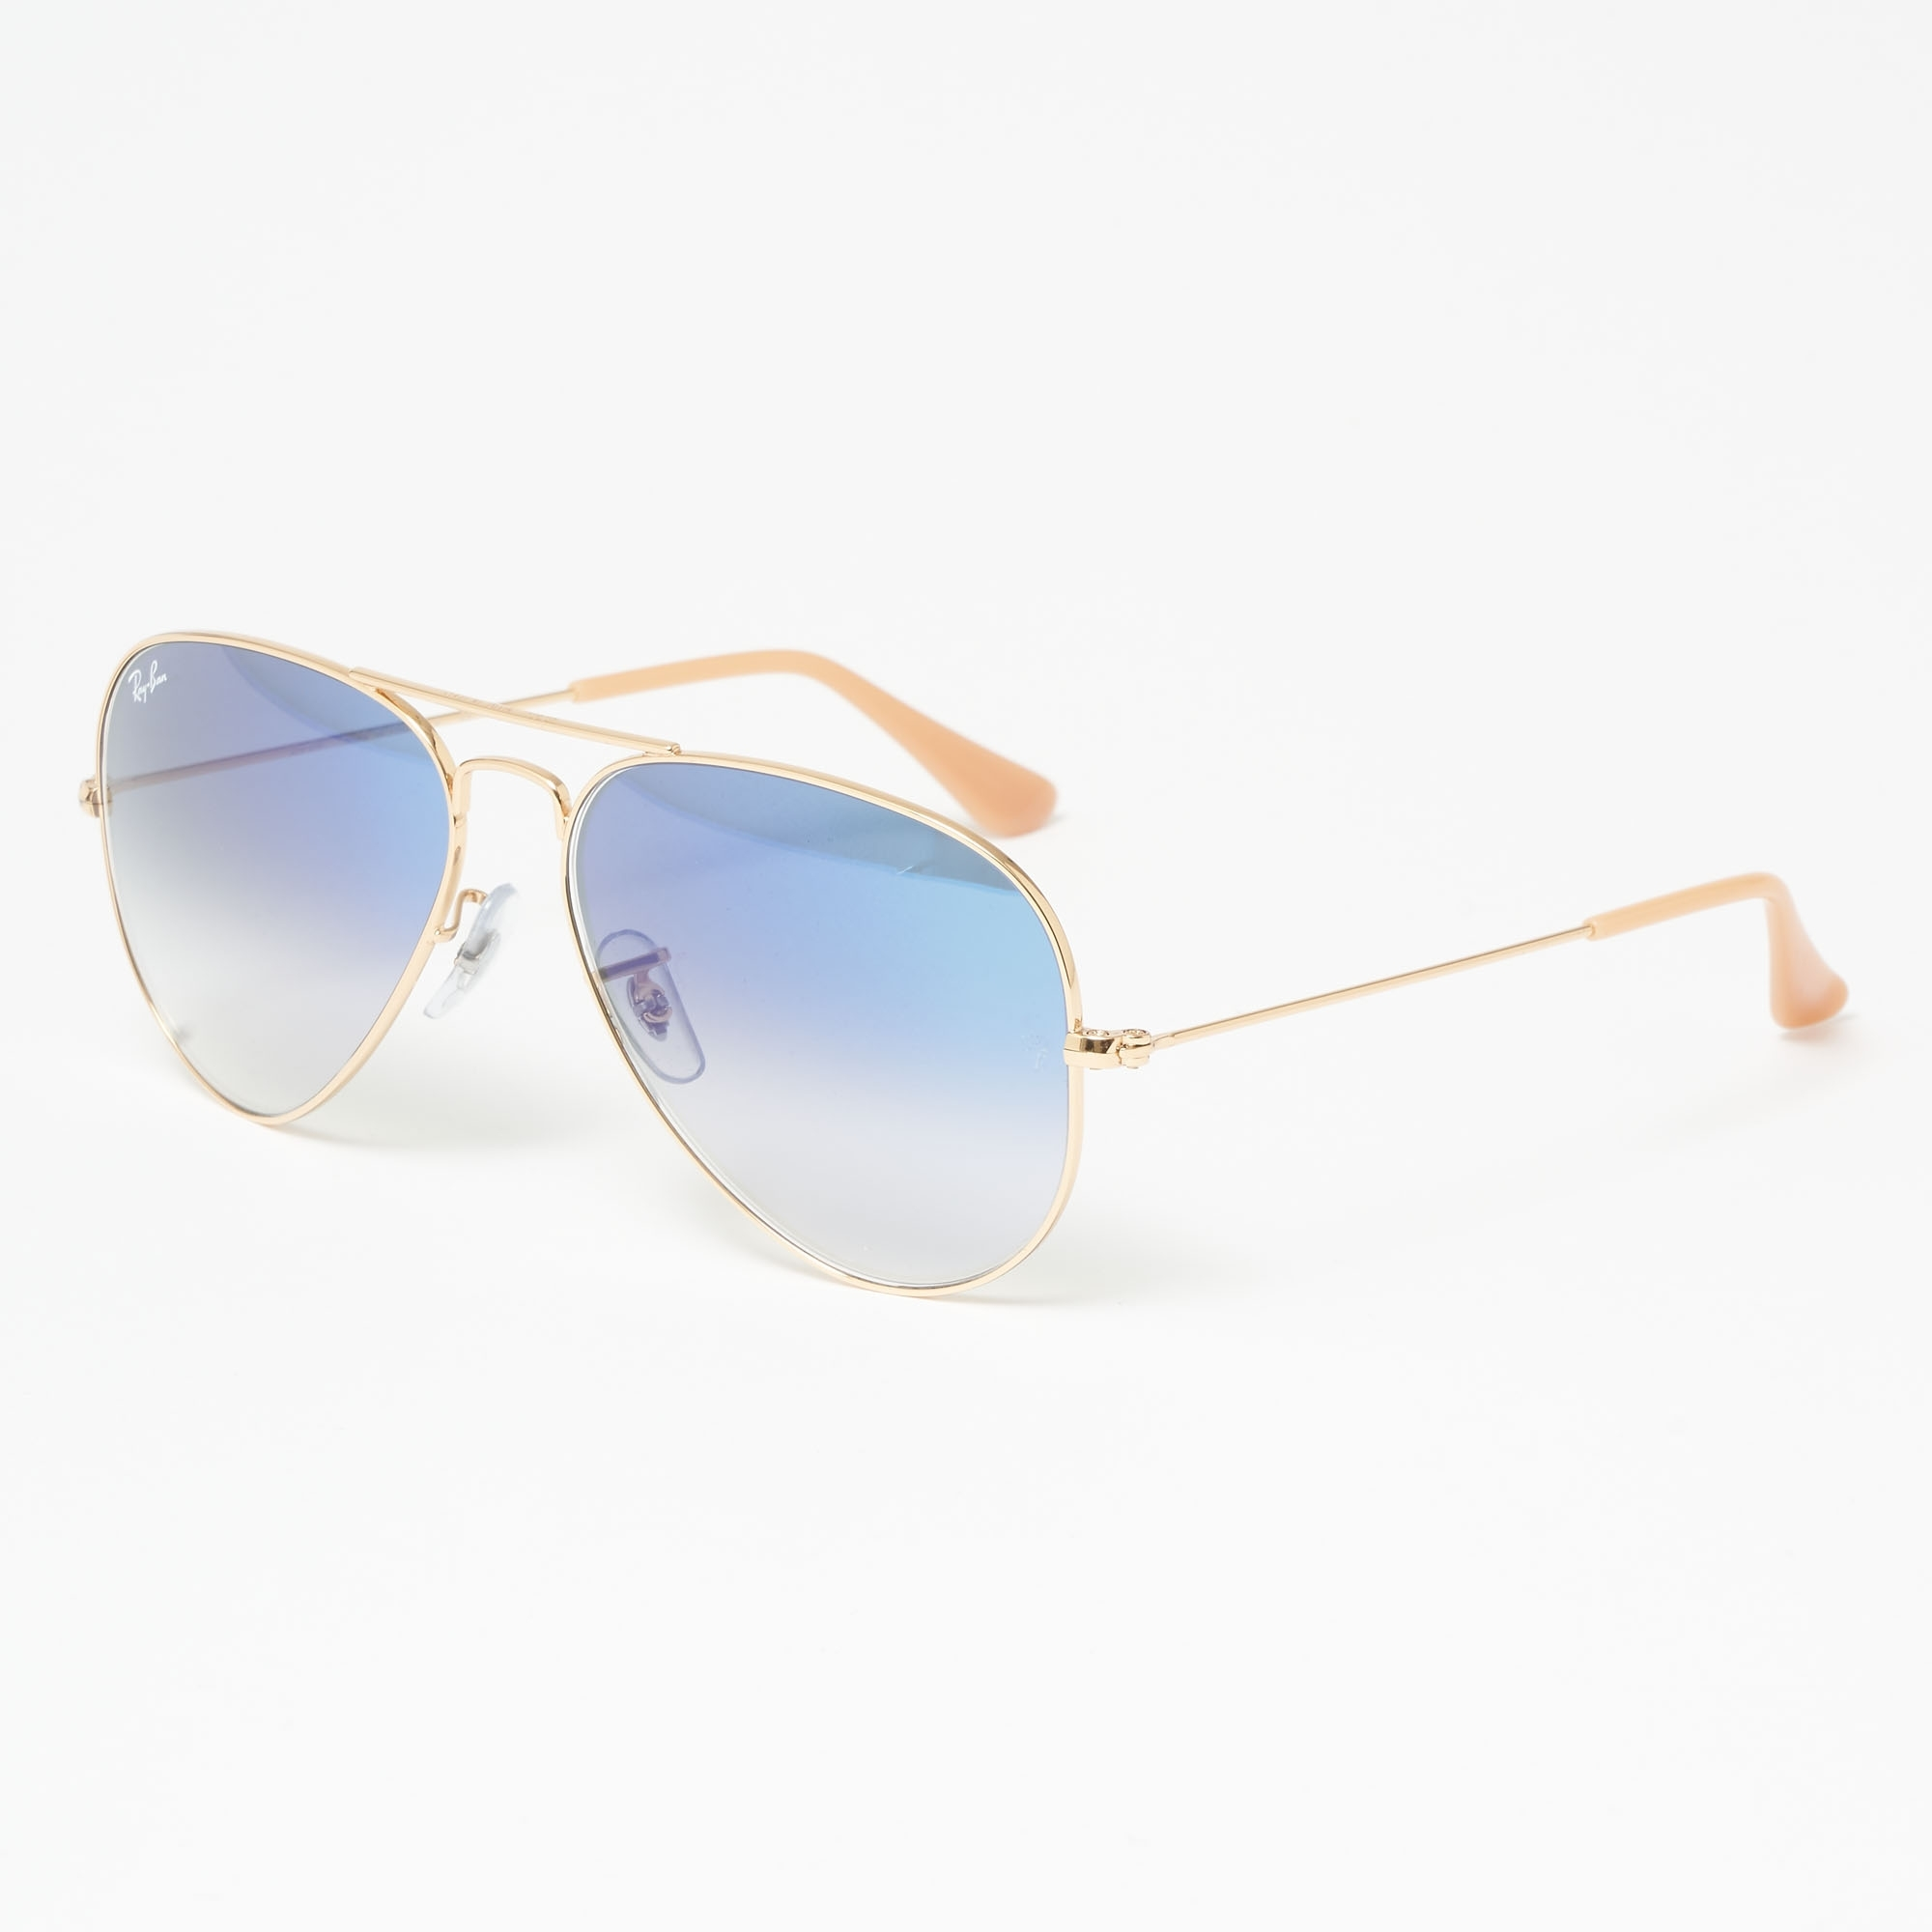 d120801291 Gold Aviator Gradient Sunglasses - Light Blue Gradient Lenses